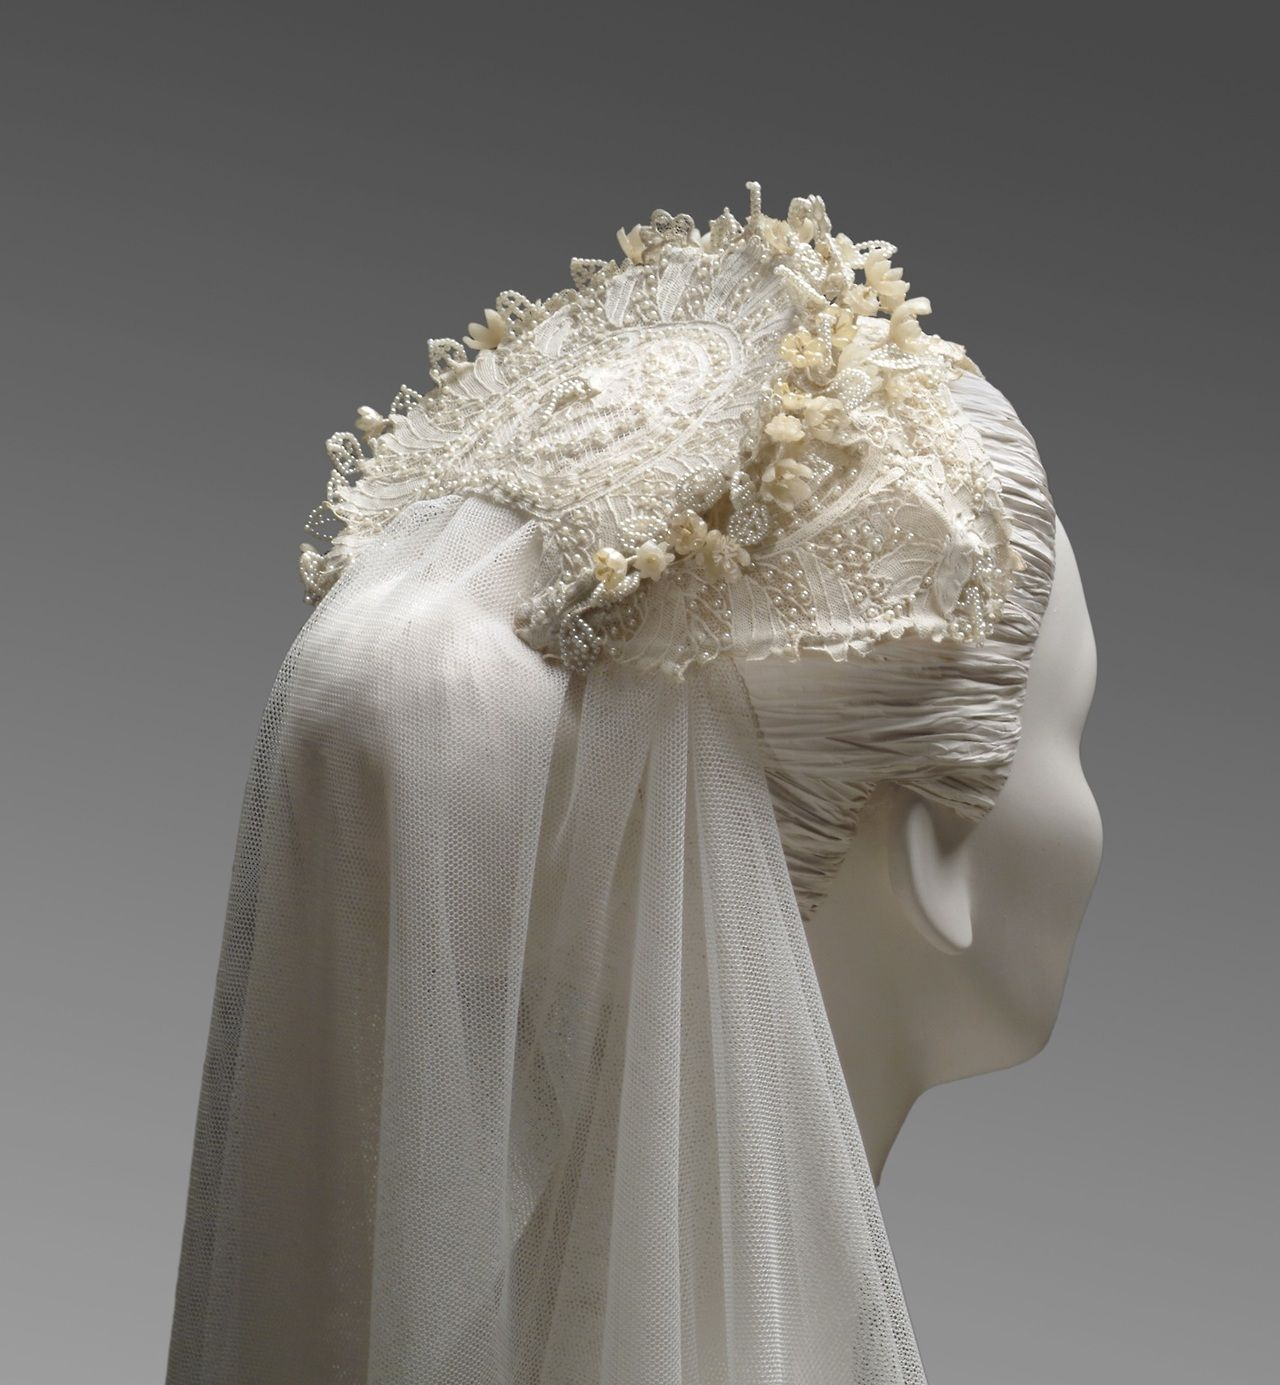 Vintage Wedding Dresses Philadelphia: Grace Kelly's Wedding Headpiece, 1956, Designed By Helen